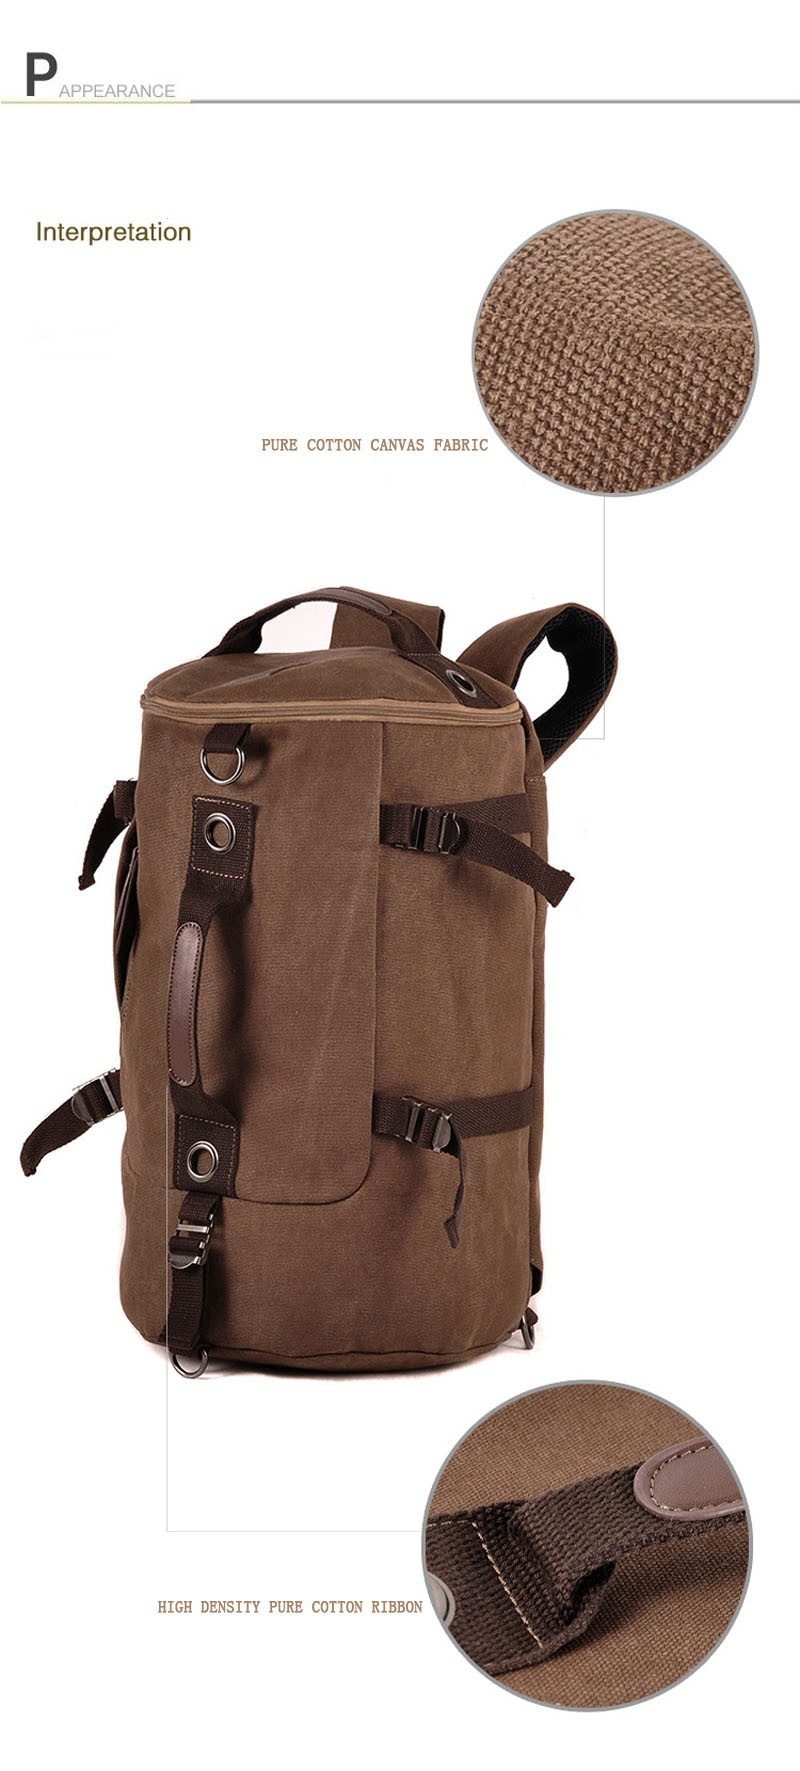 Men's Multi-Functional Backpack Vintage Shoulder Bag High Quality Canvas Male Bagpack Rucksack Travel Luggage for Weekend 27